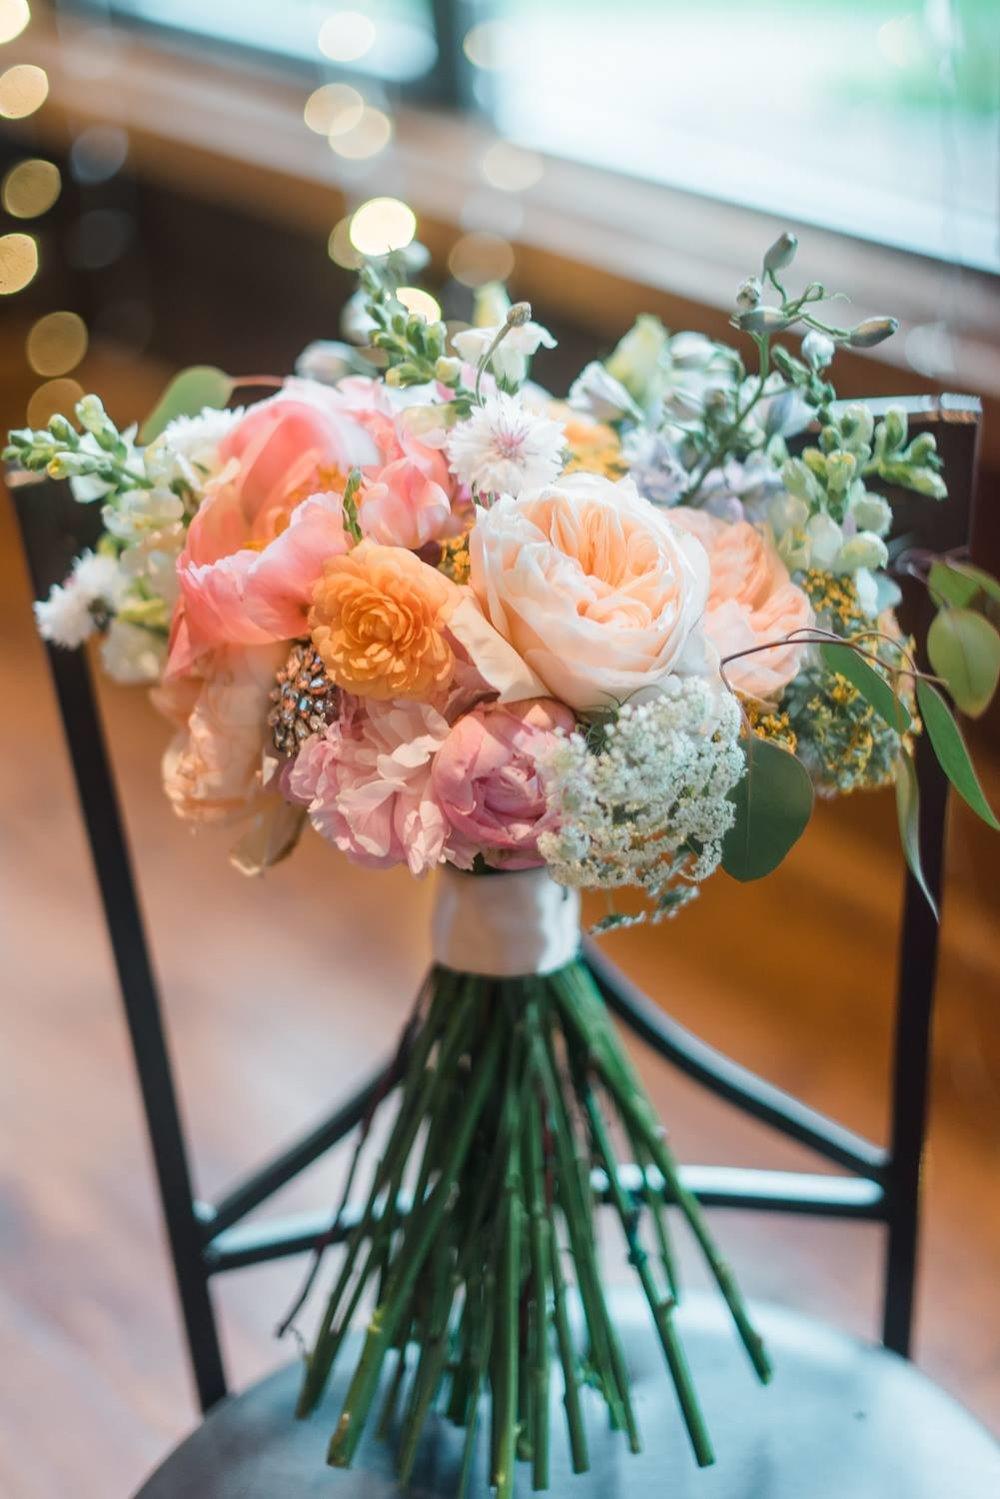 pittsburgh-botanic-garden-wedding-rustic-romantic-pennsylvania-0002.jpg